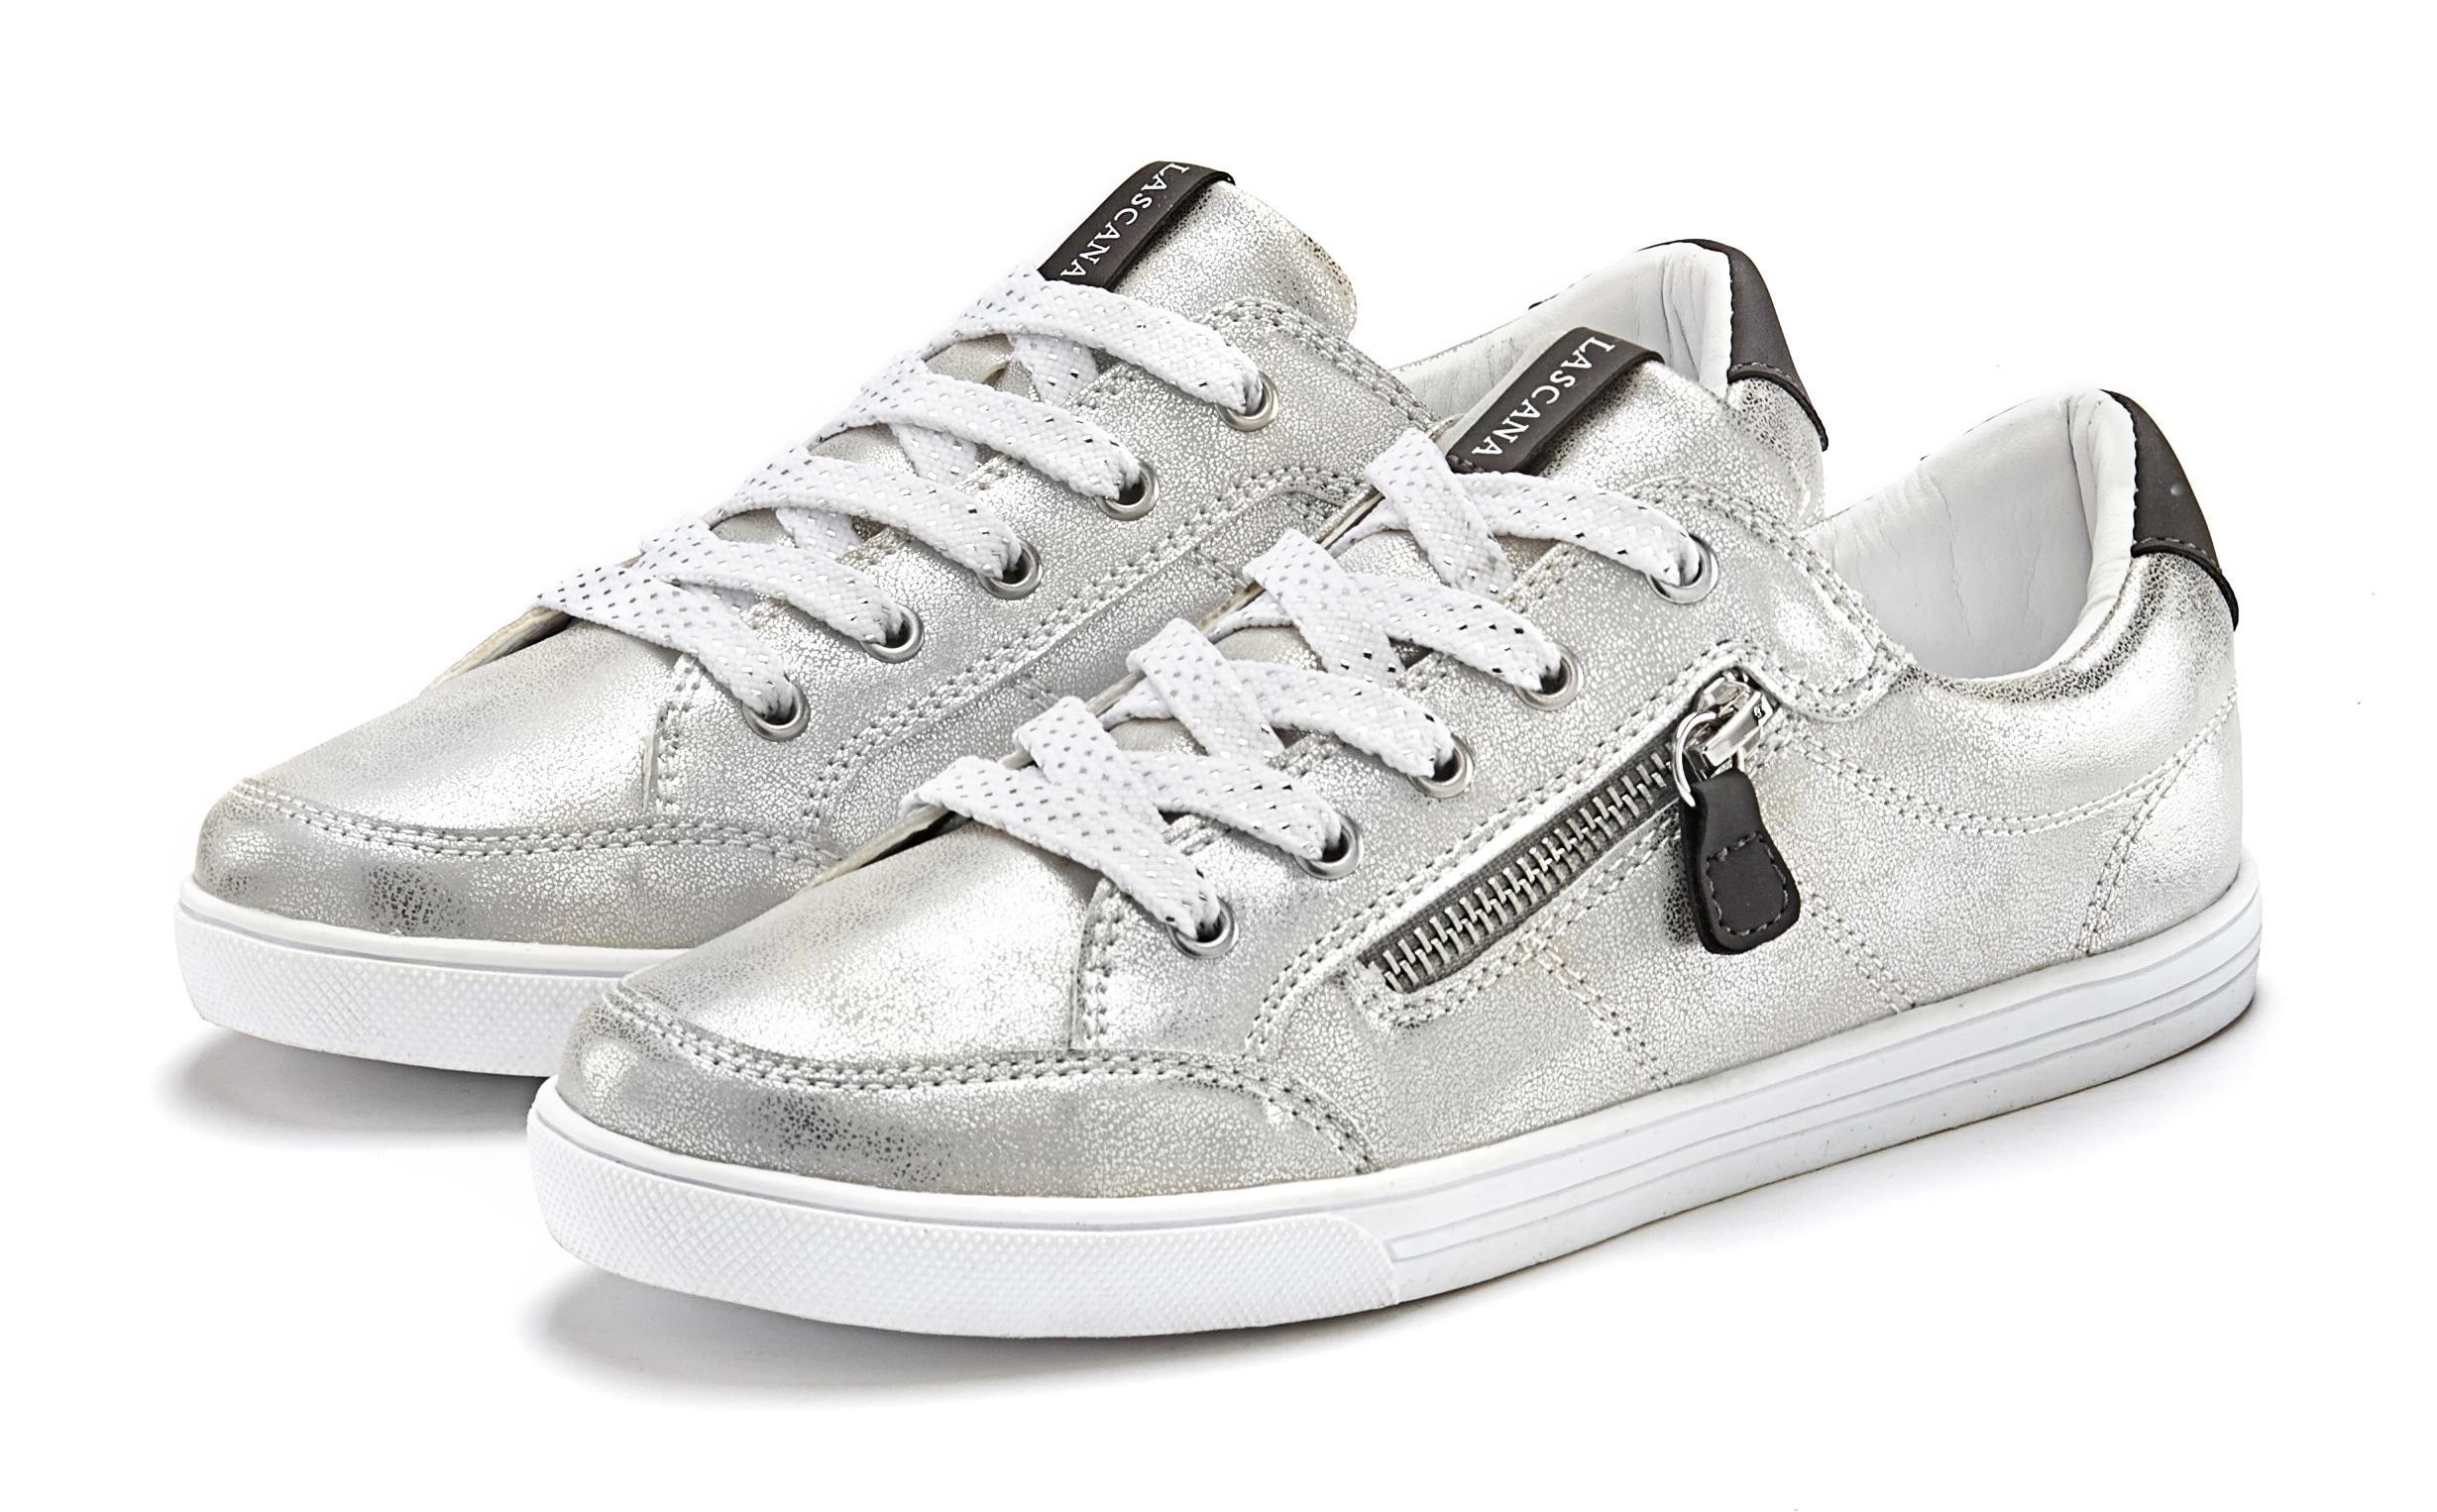 LASCANA sneakers online kopen op otto.nl